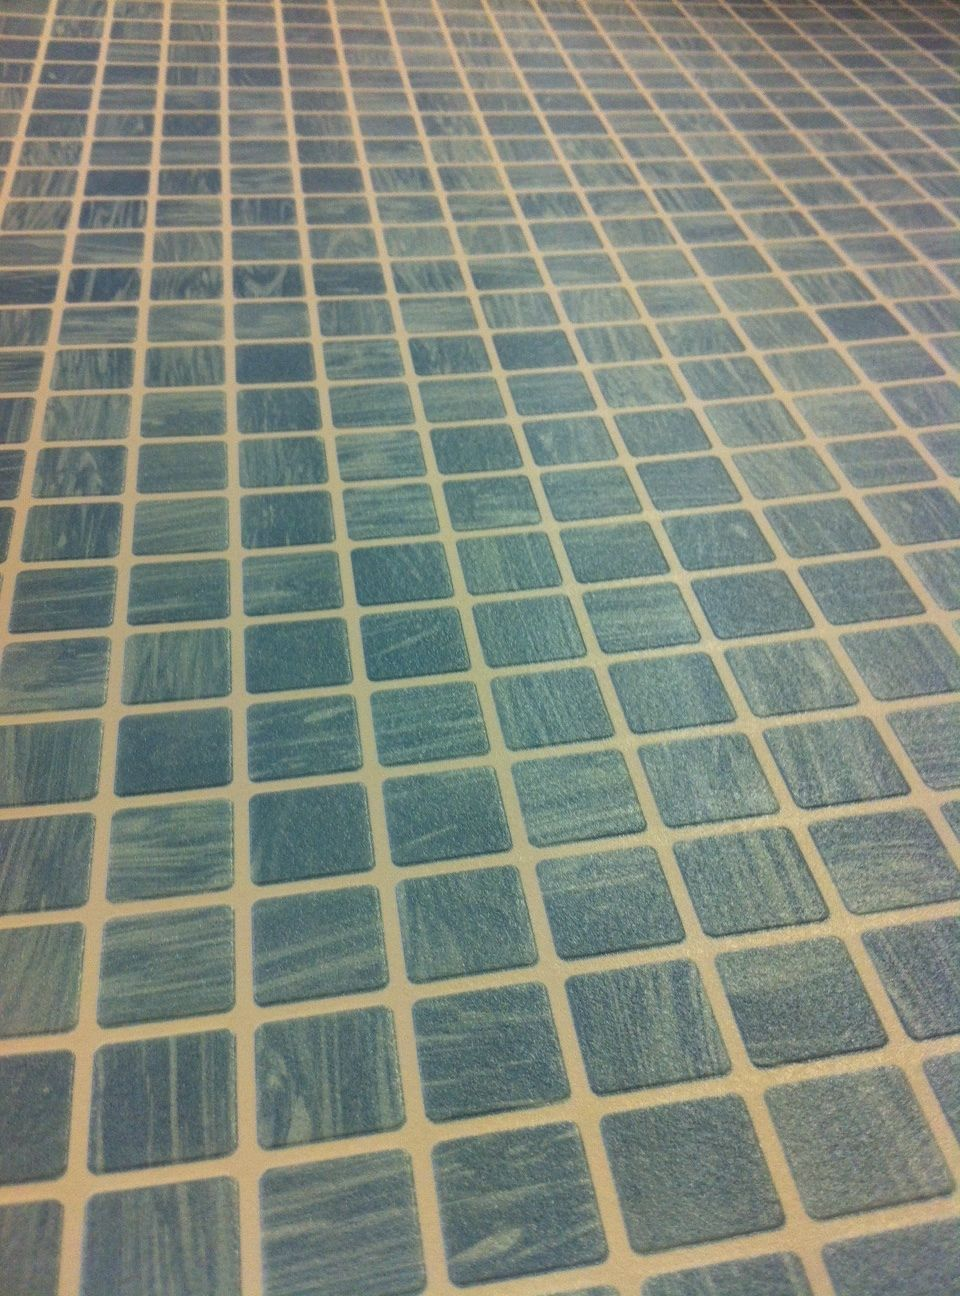 Tile on a roll wallpaper aqua blue teal mosaic kitchen for Tiling on a roll kitchen wallpaper